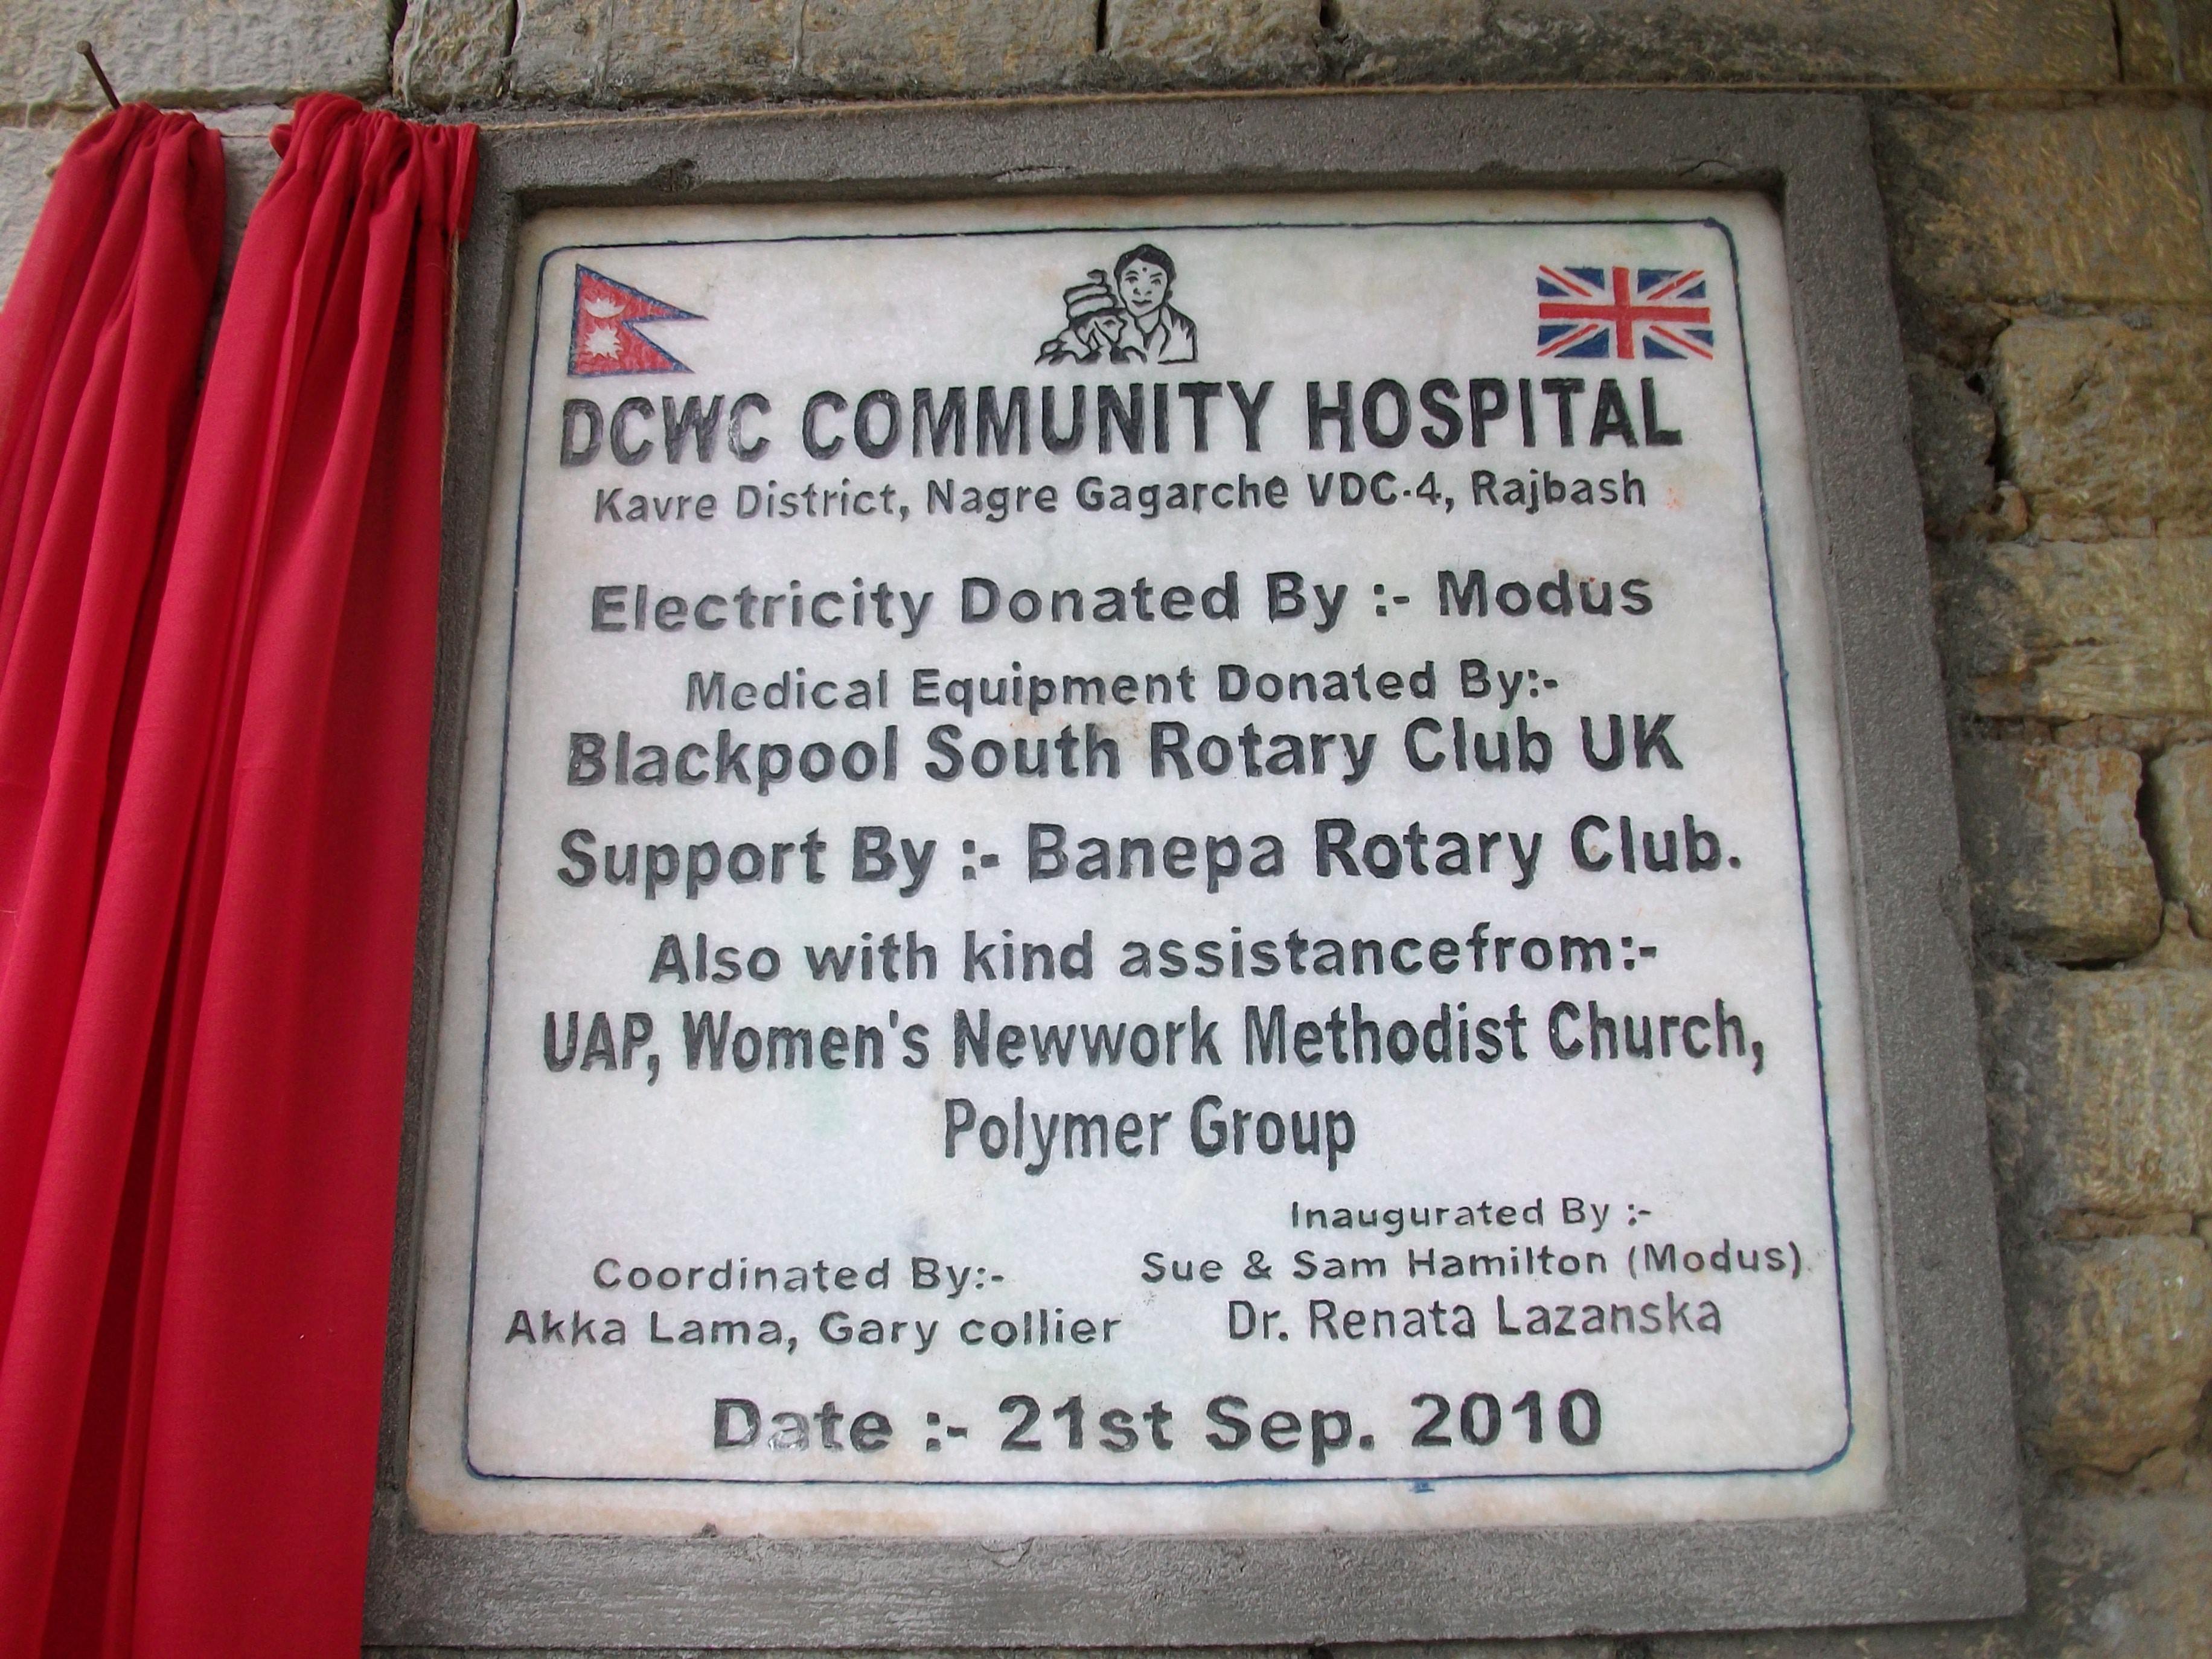 DCWC Community Hospital